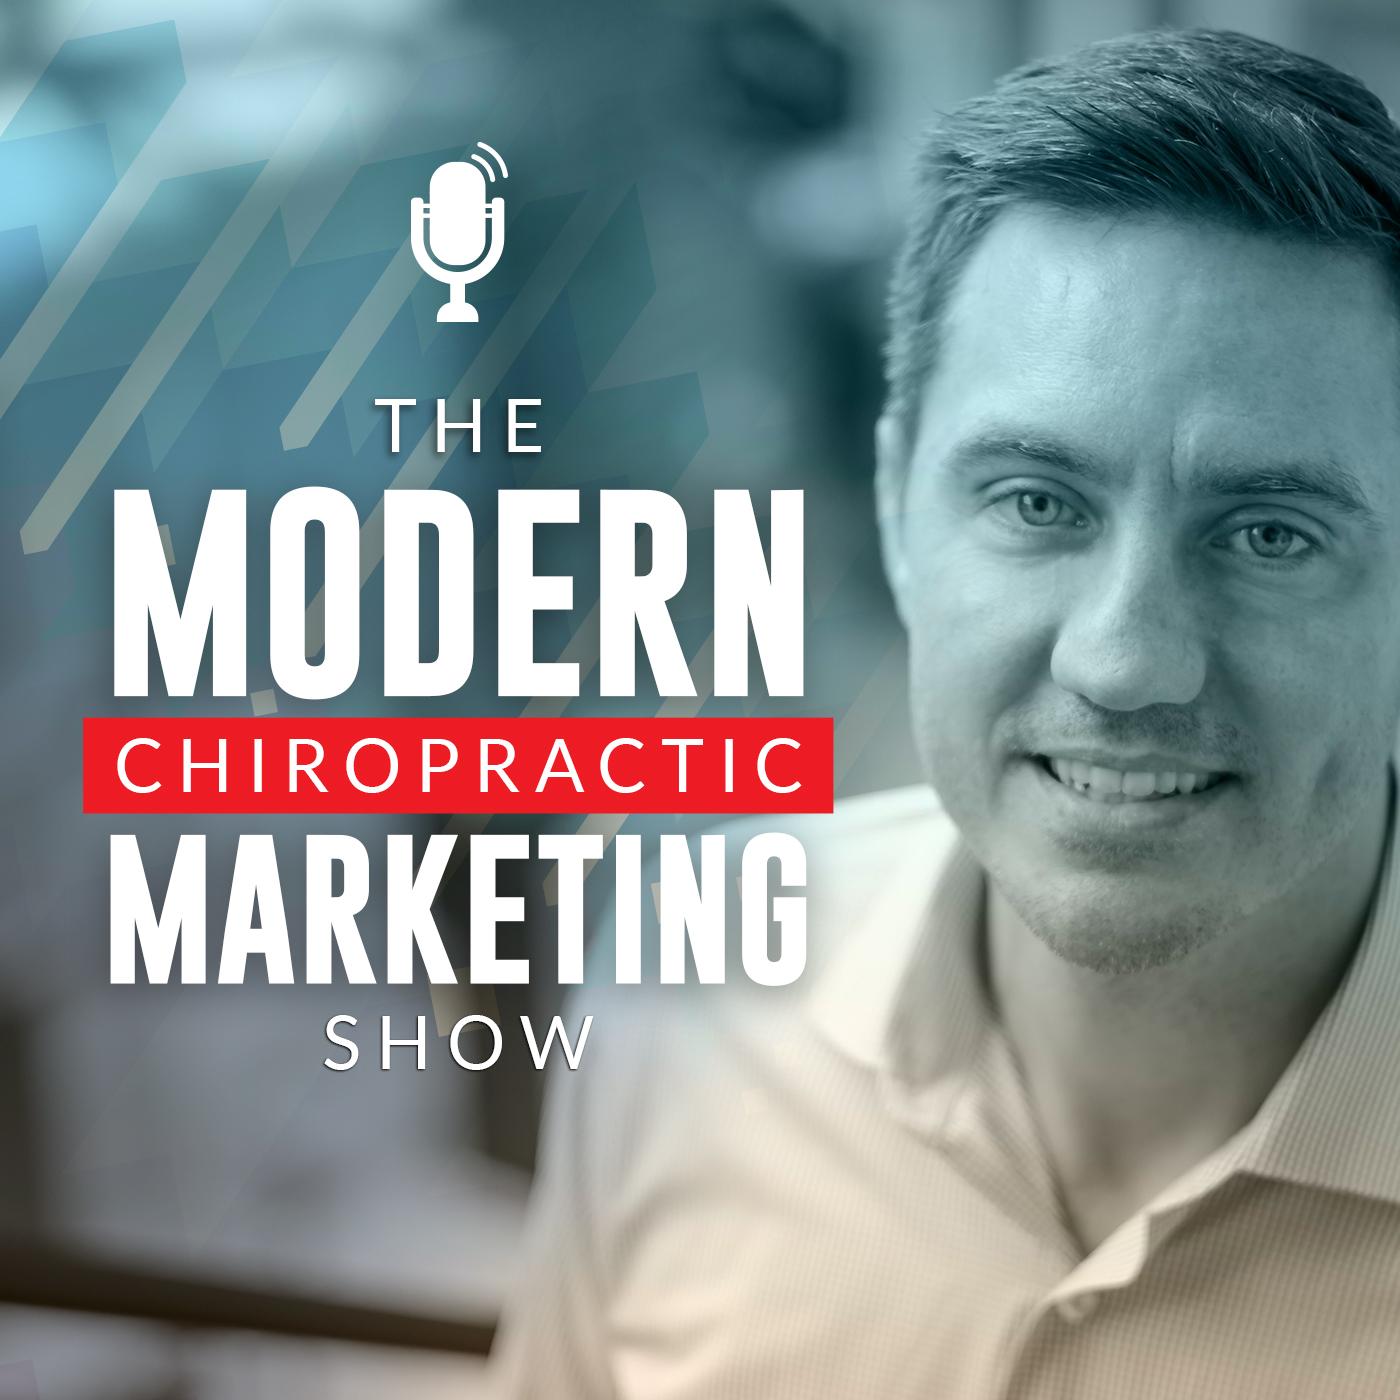 The Modern Chiropractic Marketing Show